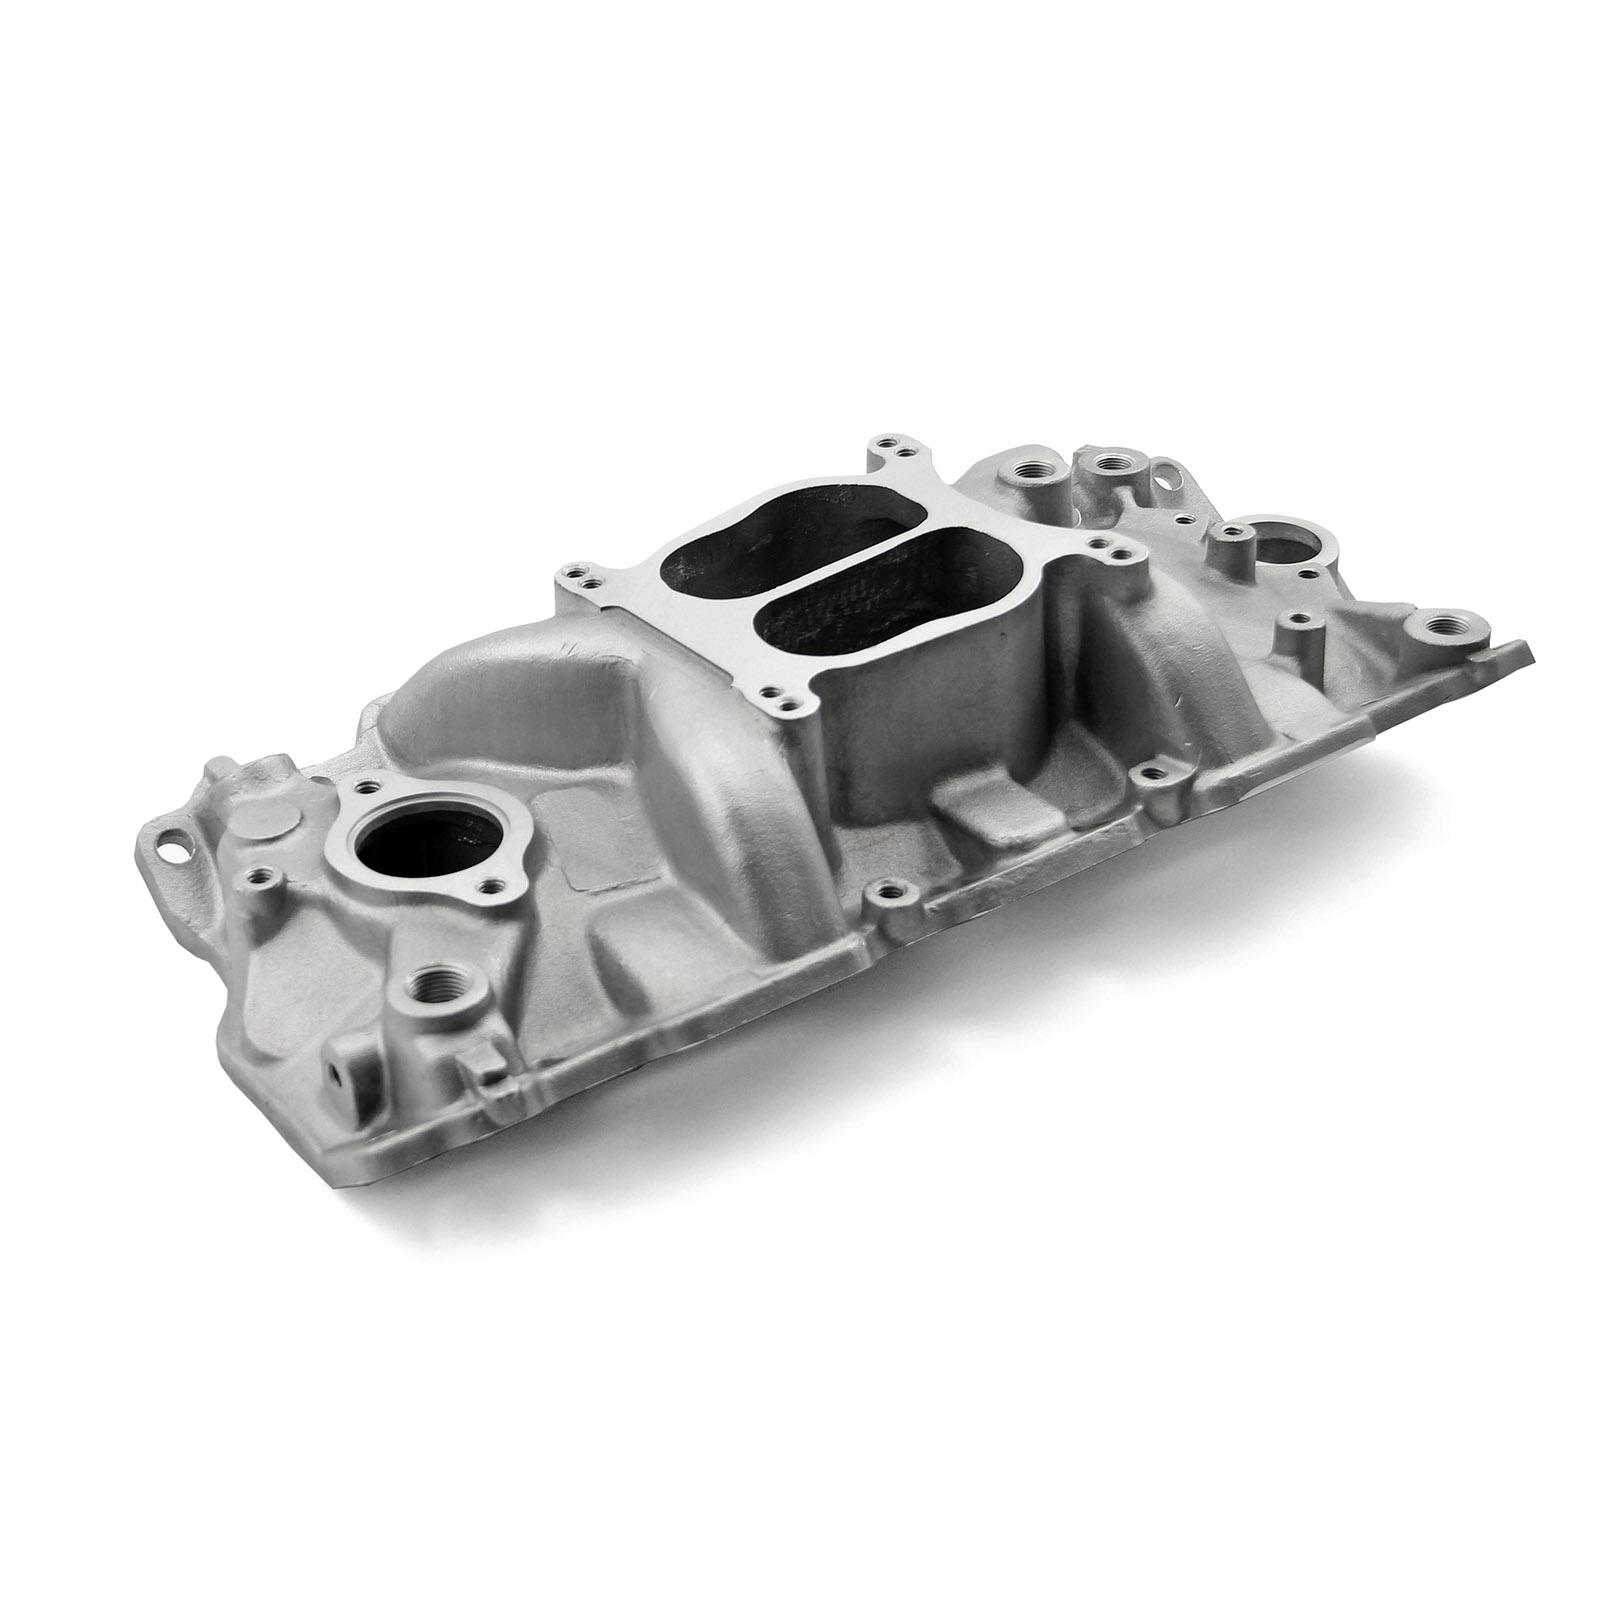 Chevy SBC 350 Holeshot 1957-95 (Non Egr) Intake Manifold